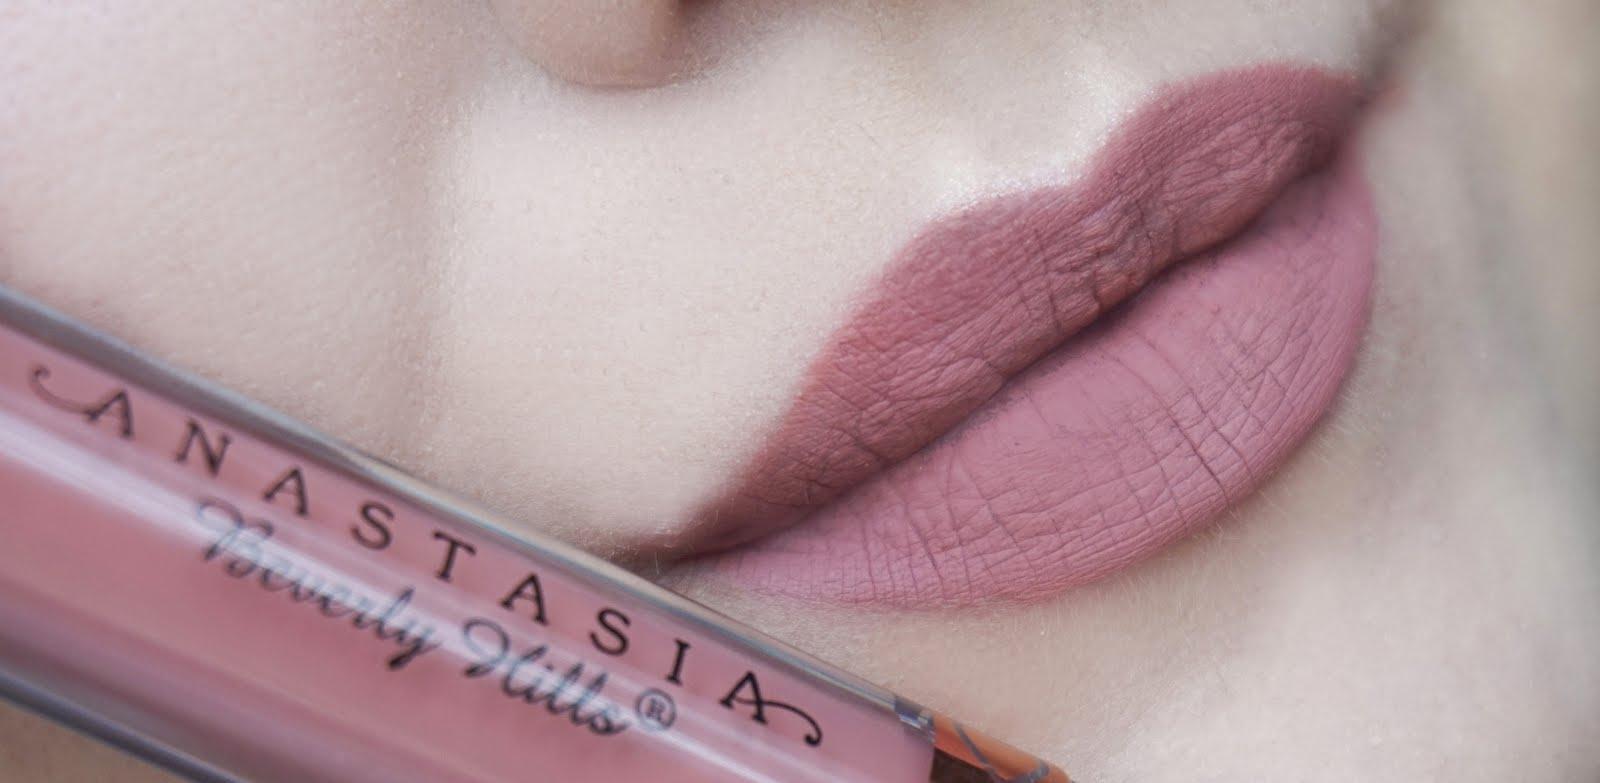 Anastasia-Beverly-Hillls-Liquid-Lipstick-Crush